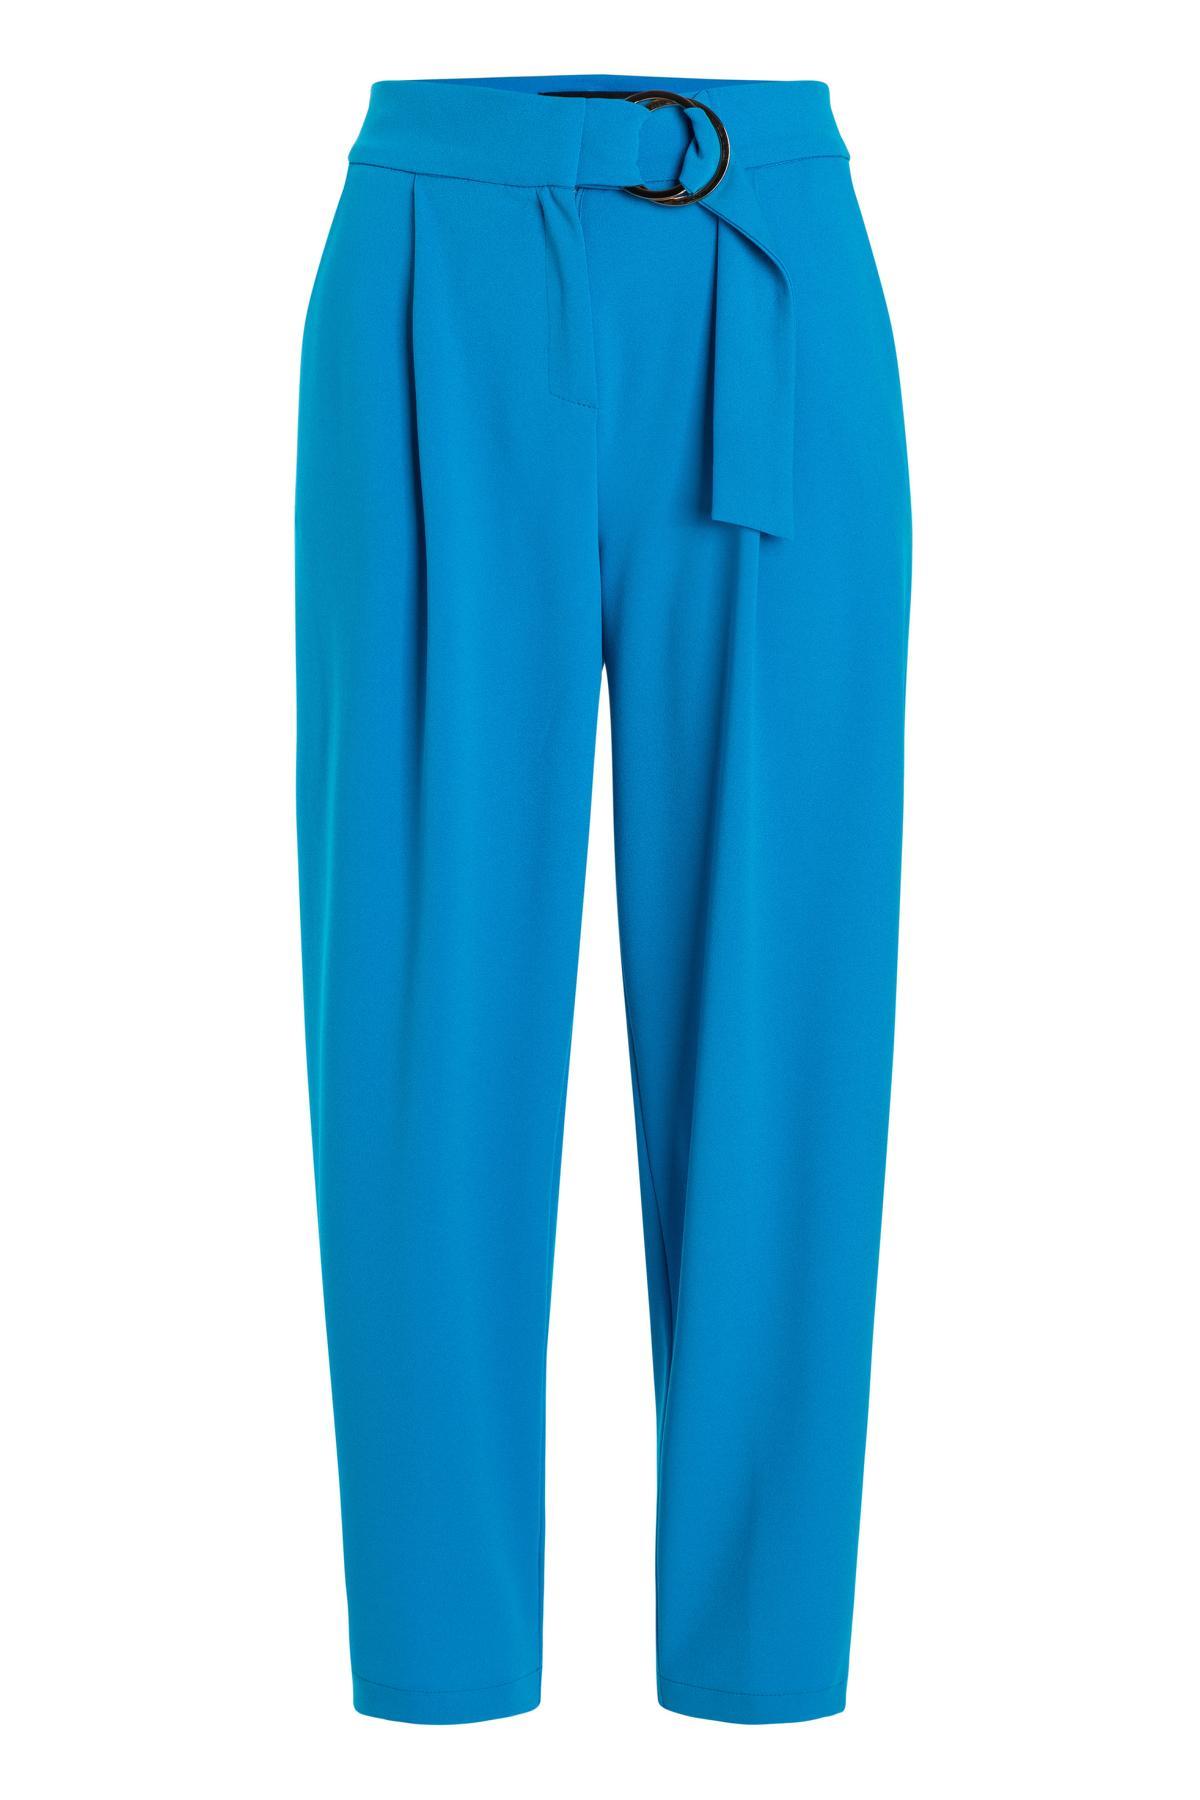 Ana Alcazar Cropped Pants Seadani Blue